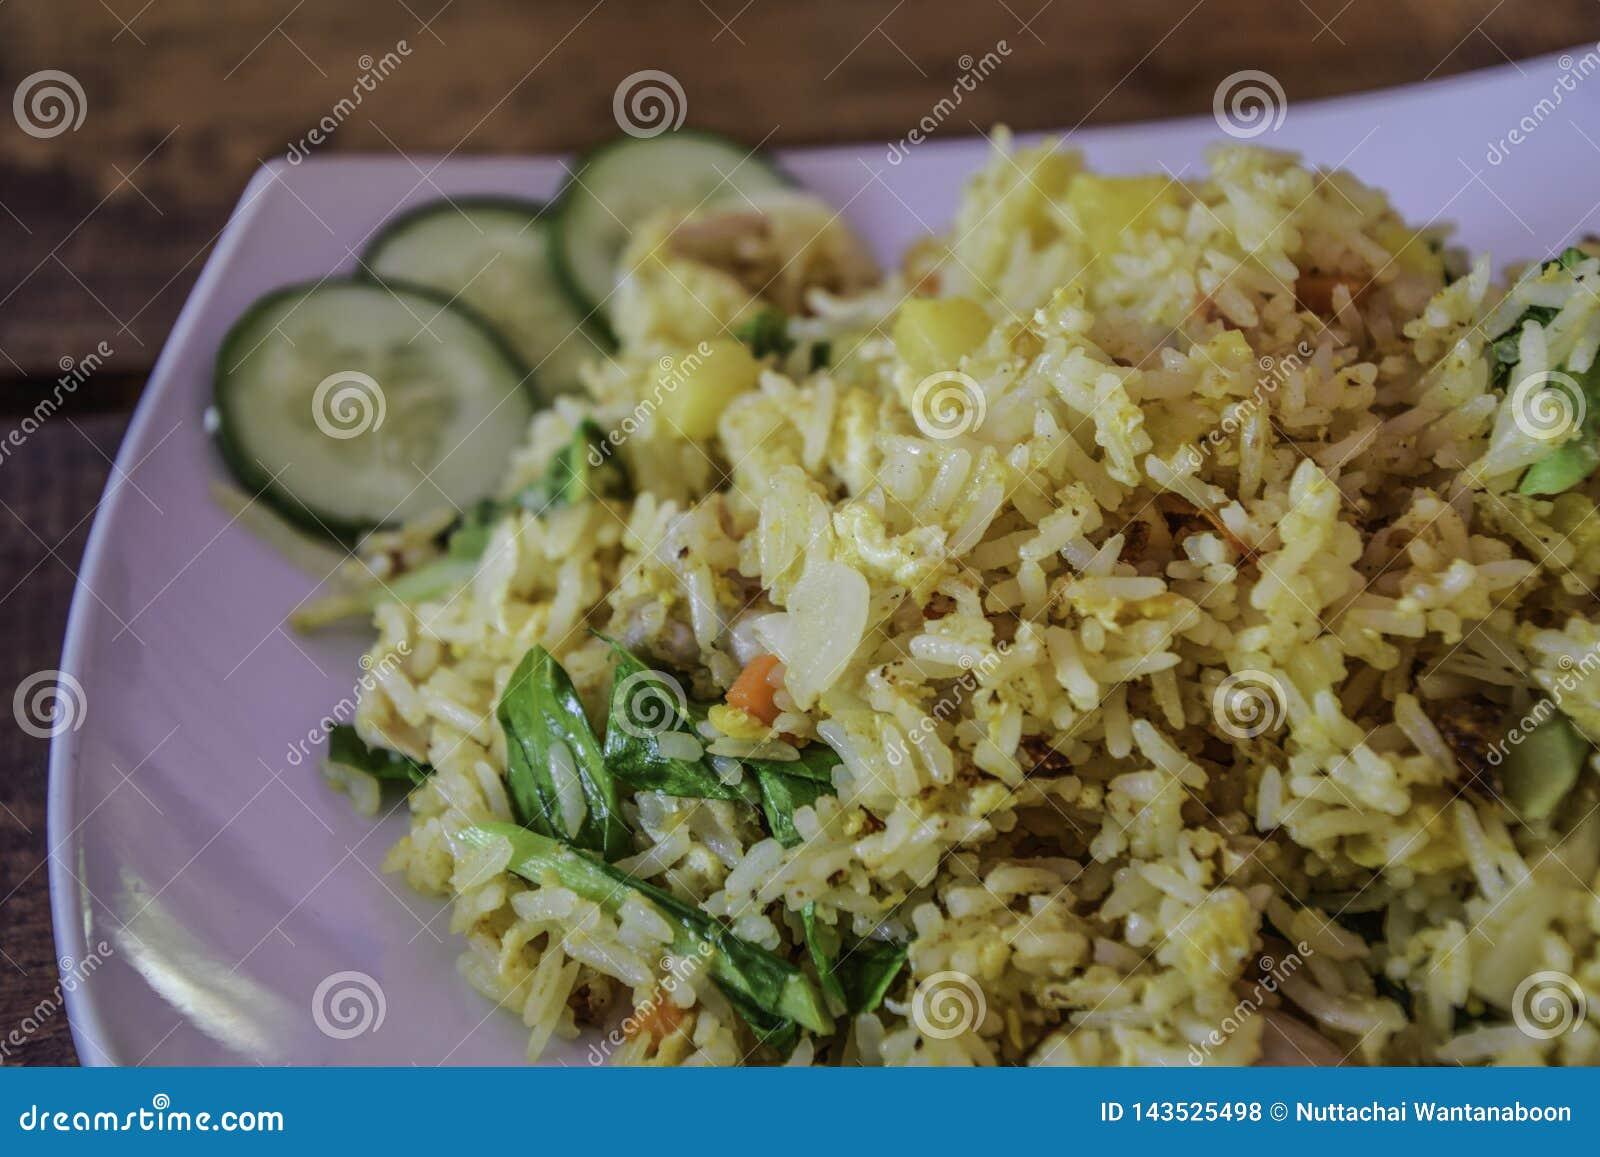 Fried Rice vegetal mezclado - comida tailandesa